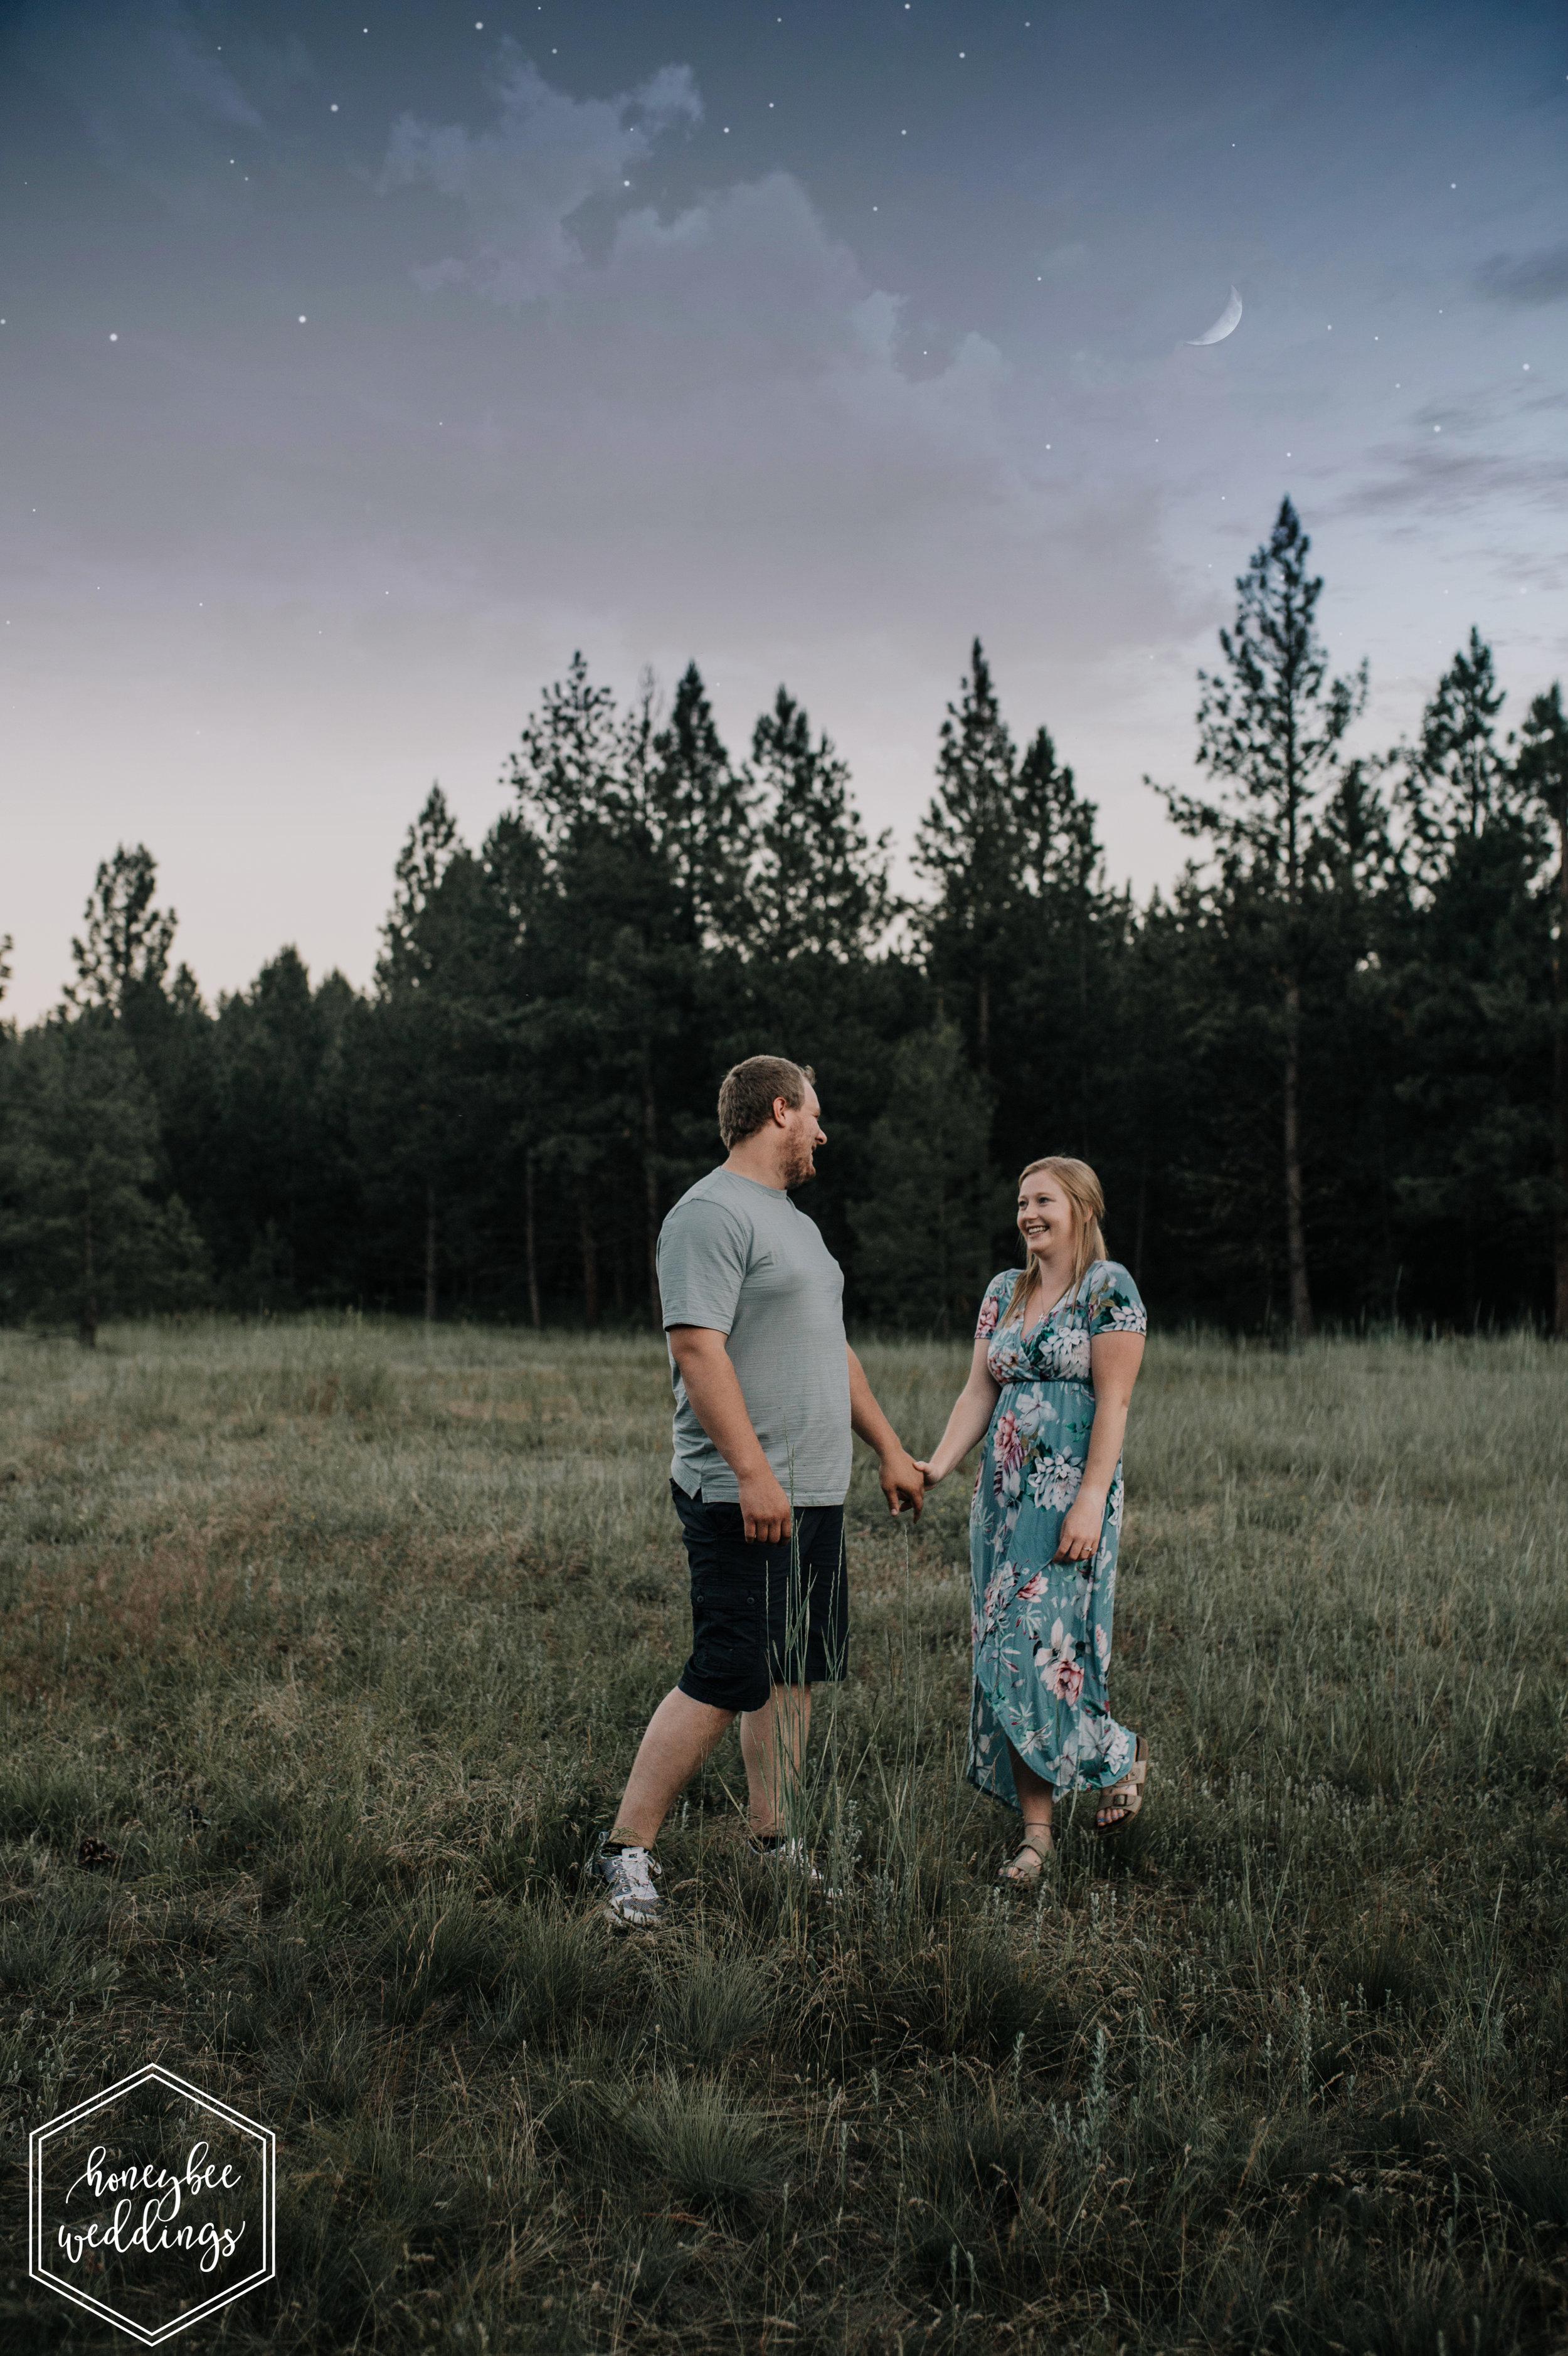 27 Montana Wedding Photographer_Missoula Engagement Session_Kenzie + Bobby 2018-8831.jpg